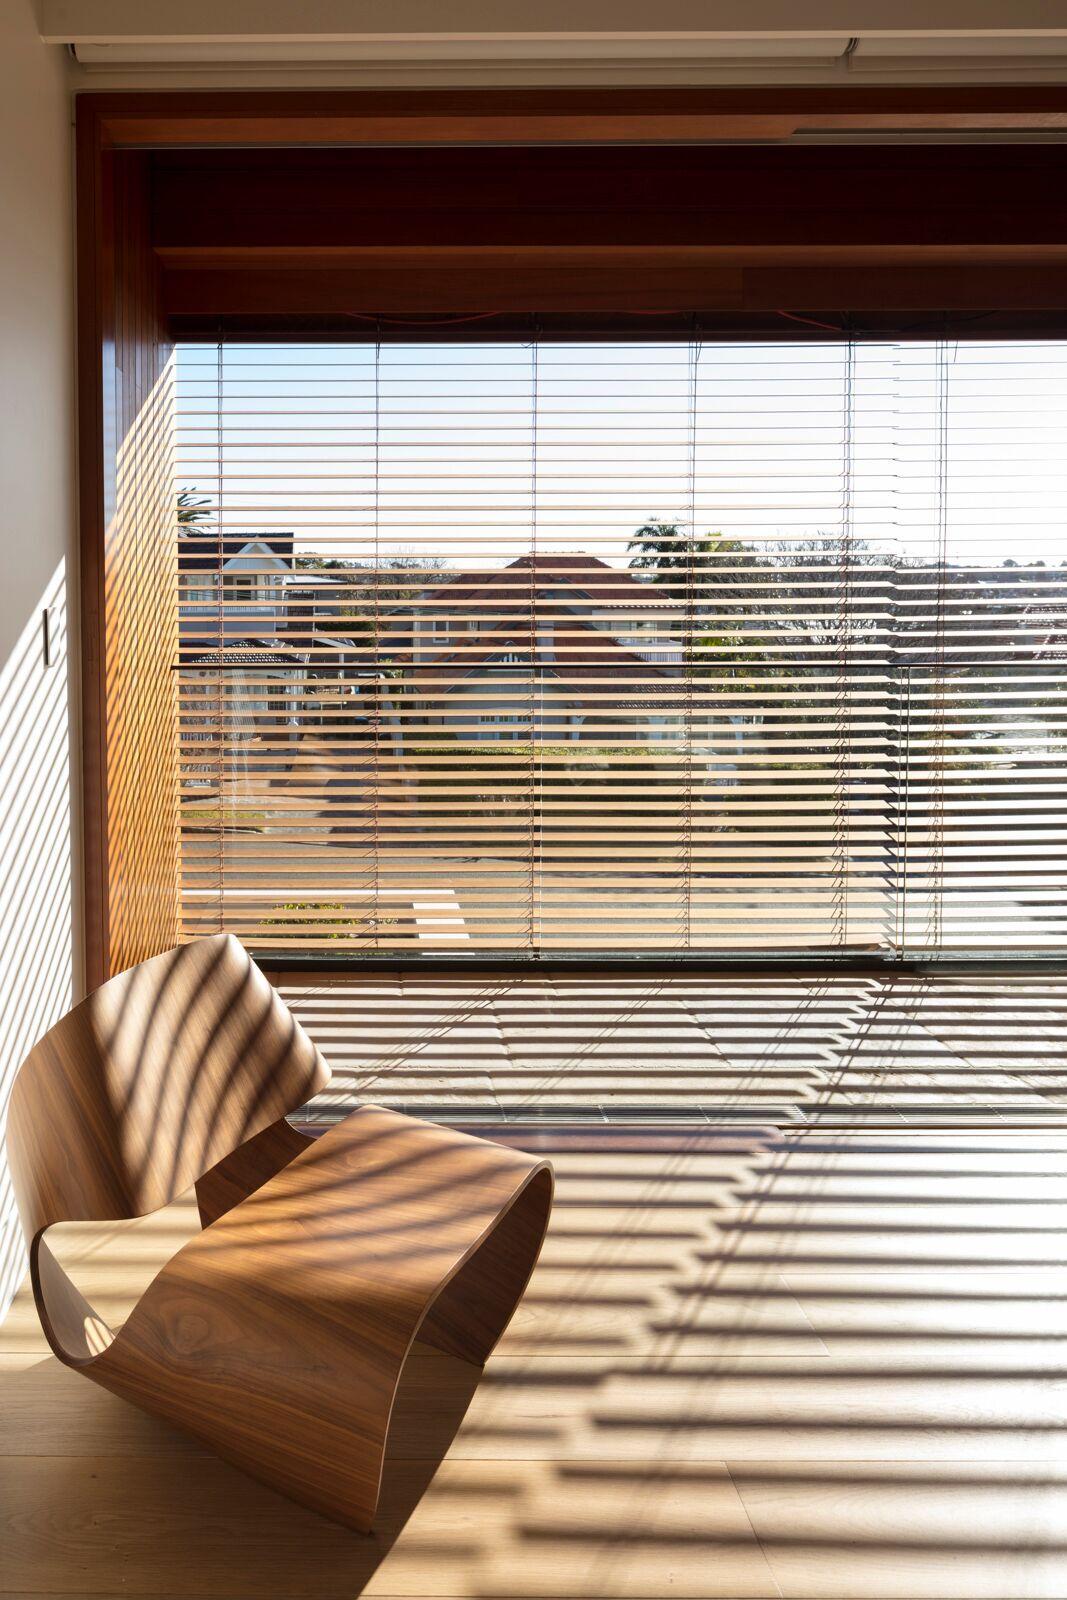 Gallery Of Methuen Residence By Daniel Boddam Local Australian Architecture & Interior Design Mosman, Sydney Image 4